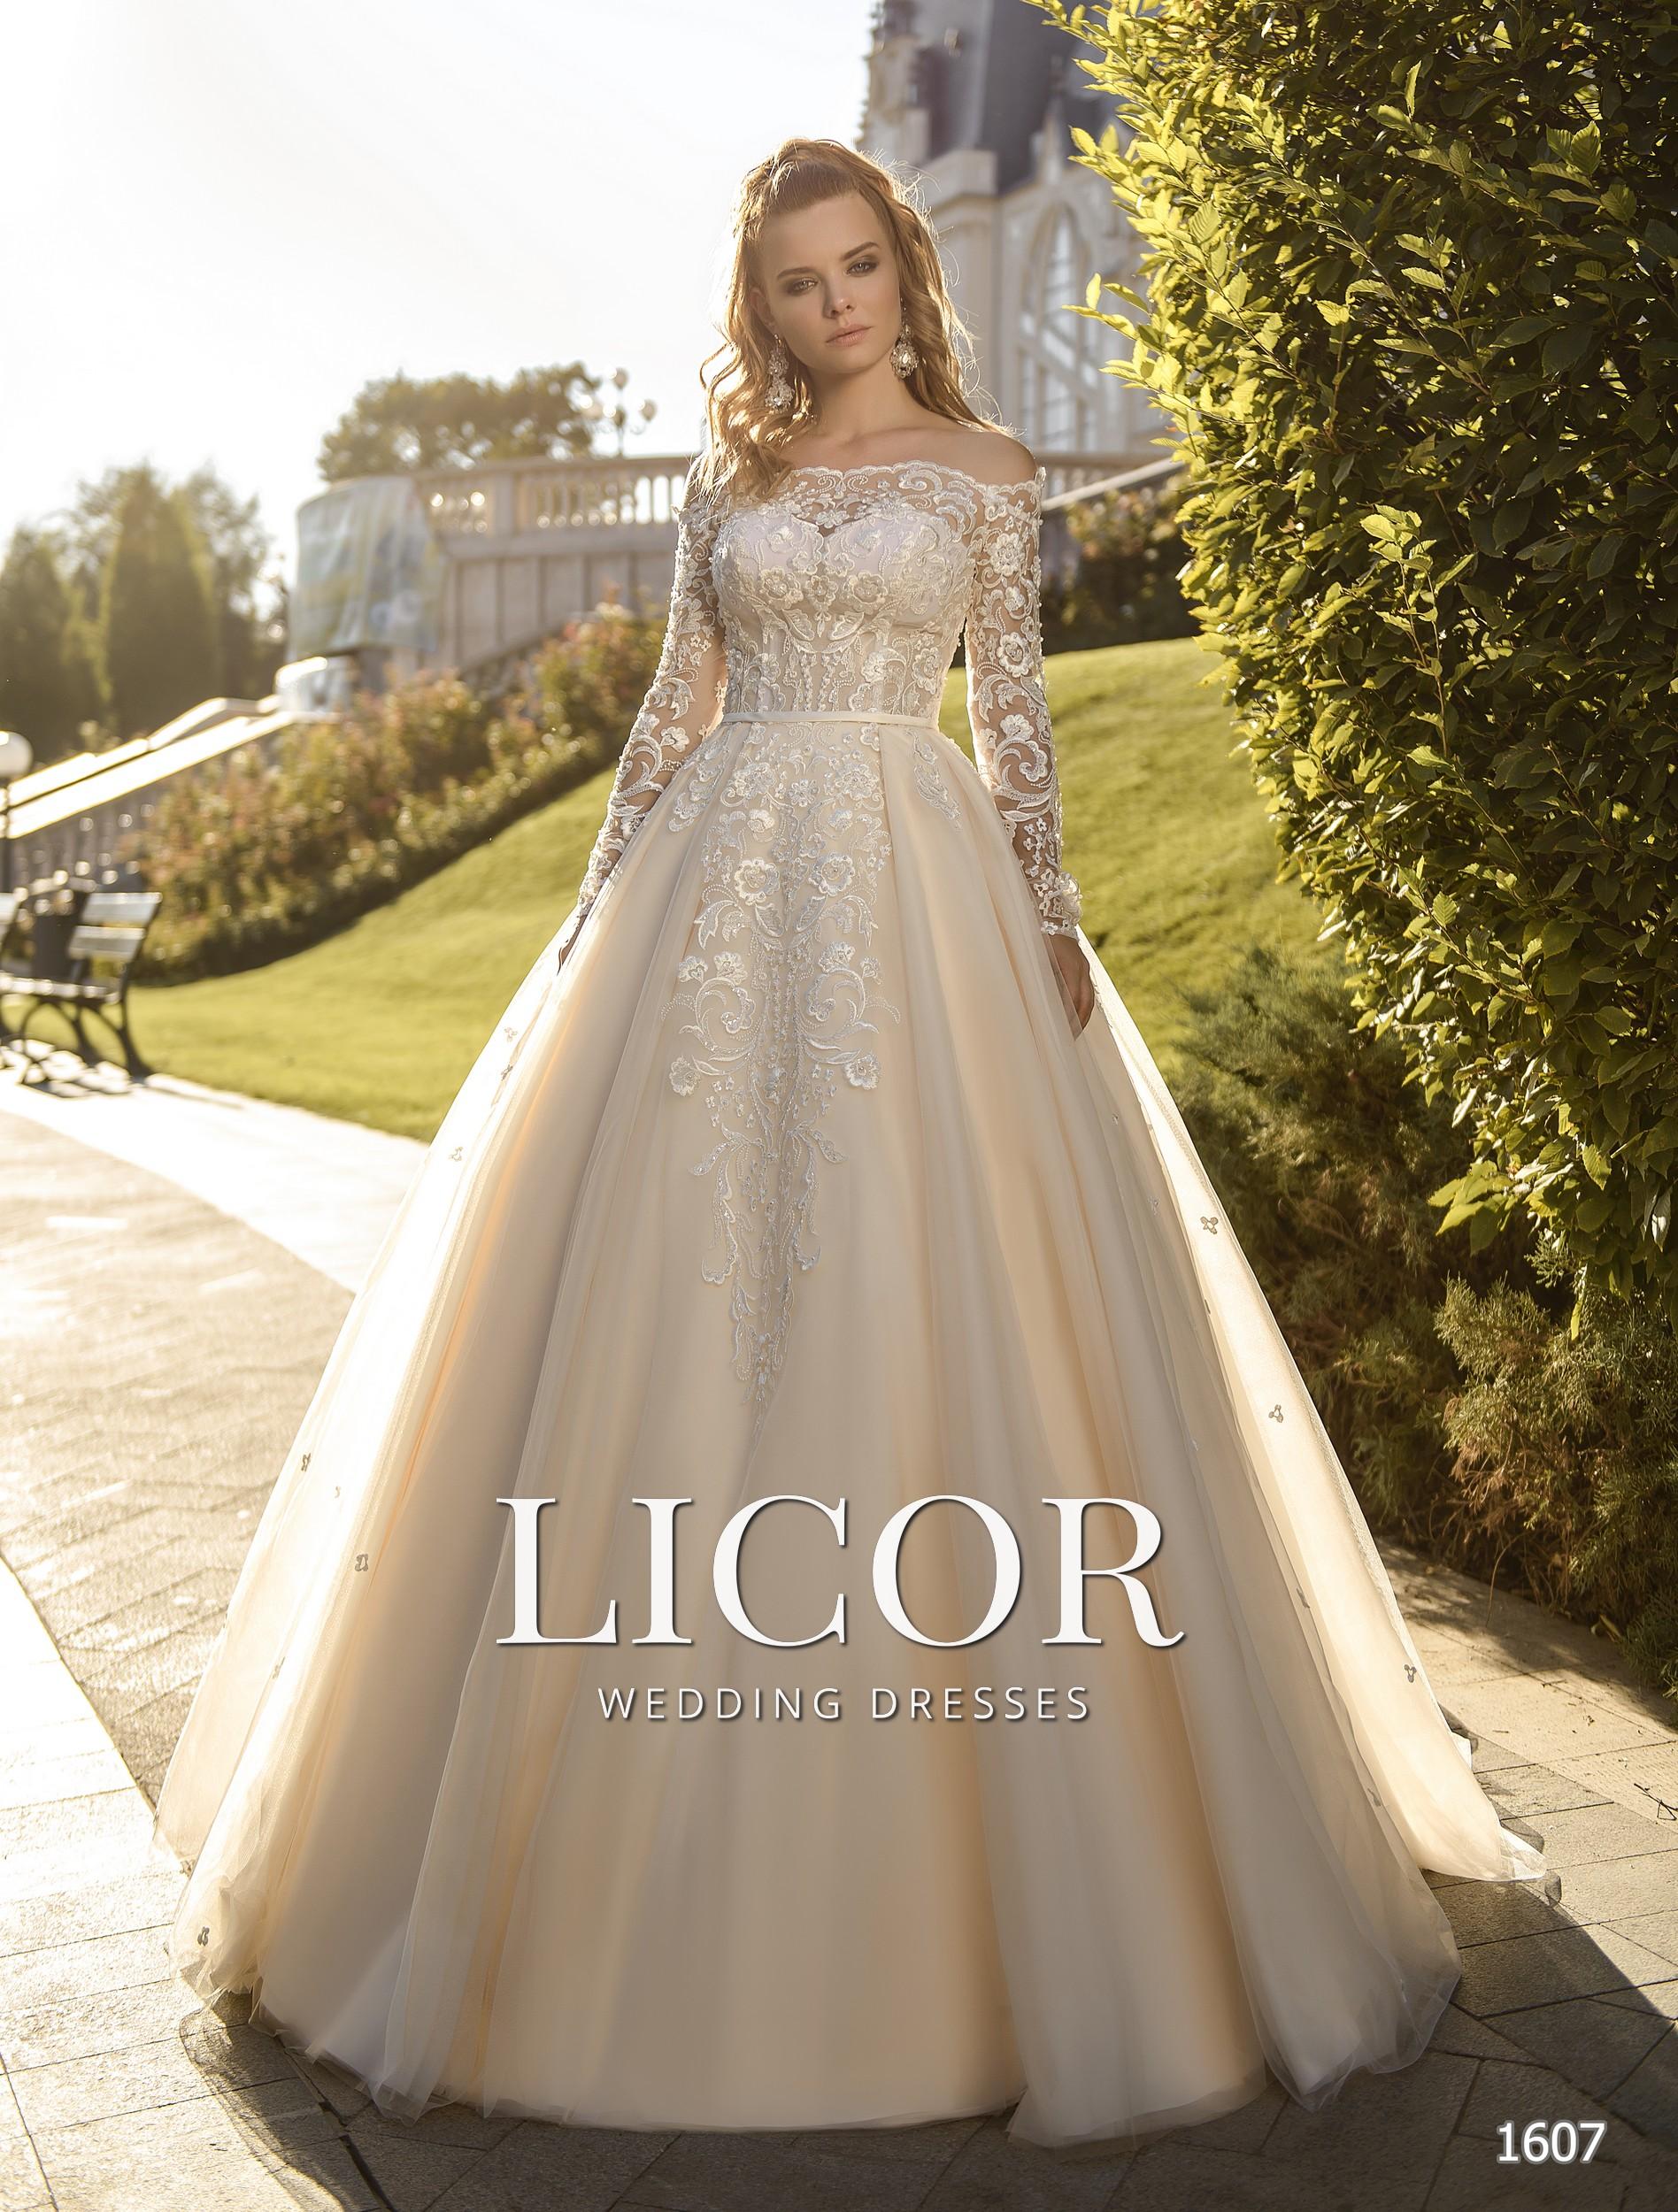 https://licor.com.ua/images/stories/virtuemart/product/1607(1).jpg